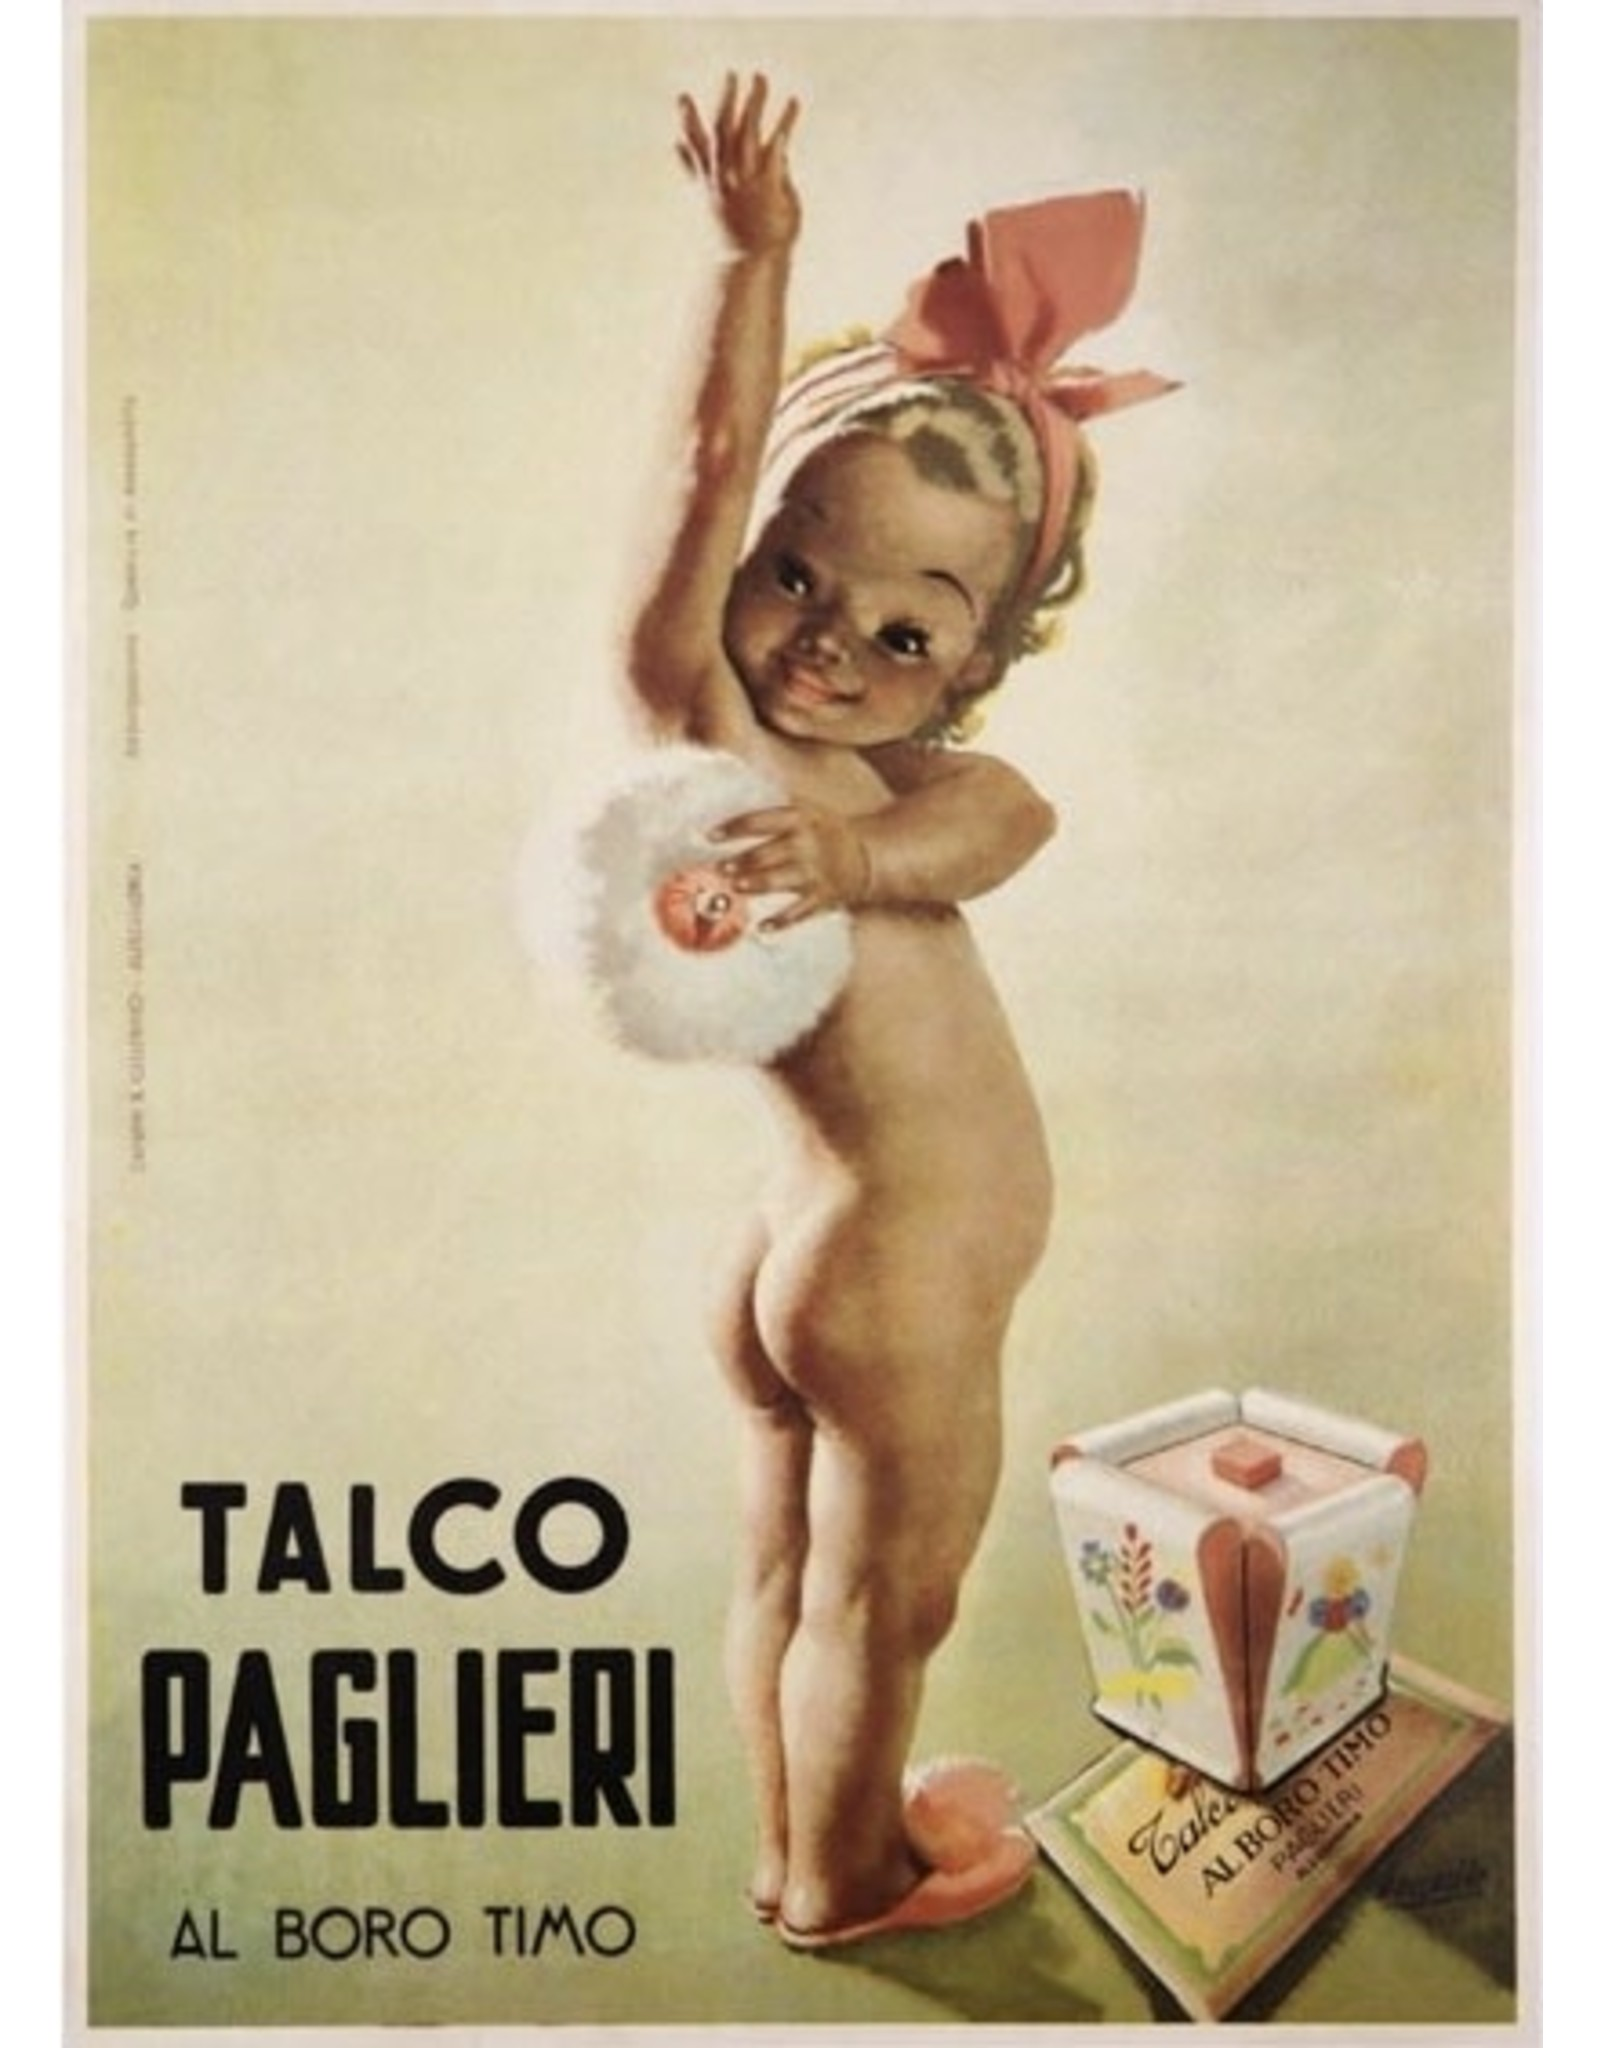 SPV Talco Paglieri Perfume poster 1950 by Gino Boccasile original vintage poster on linen